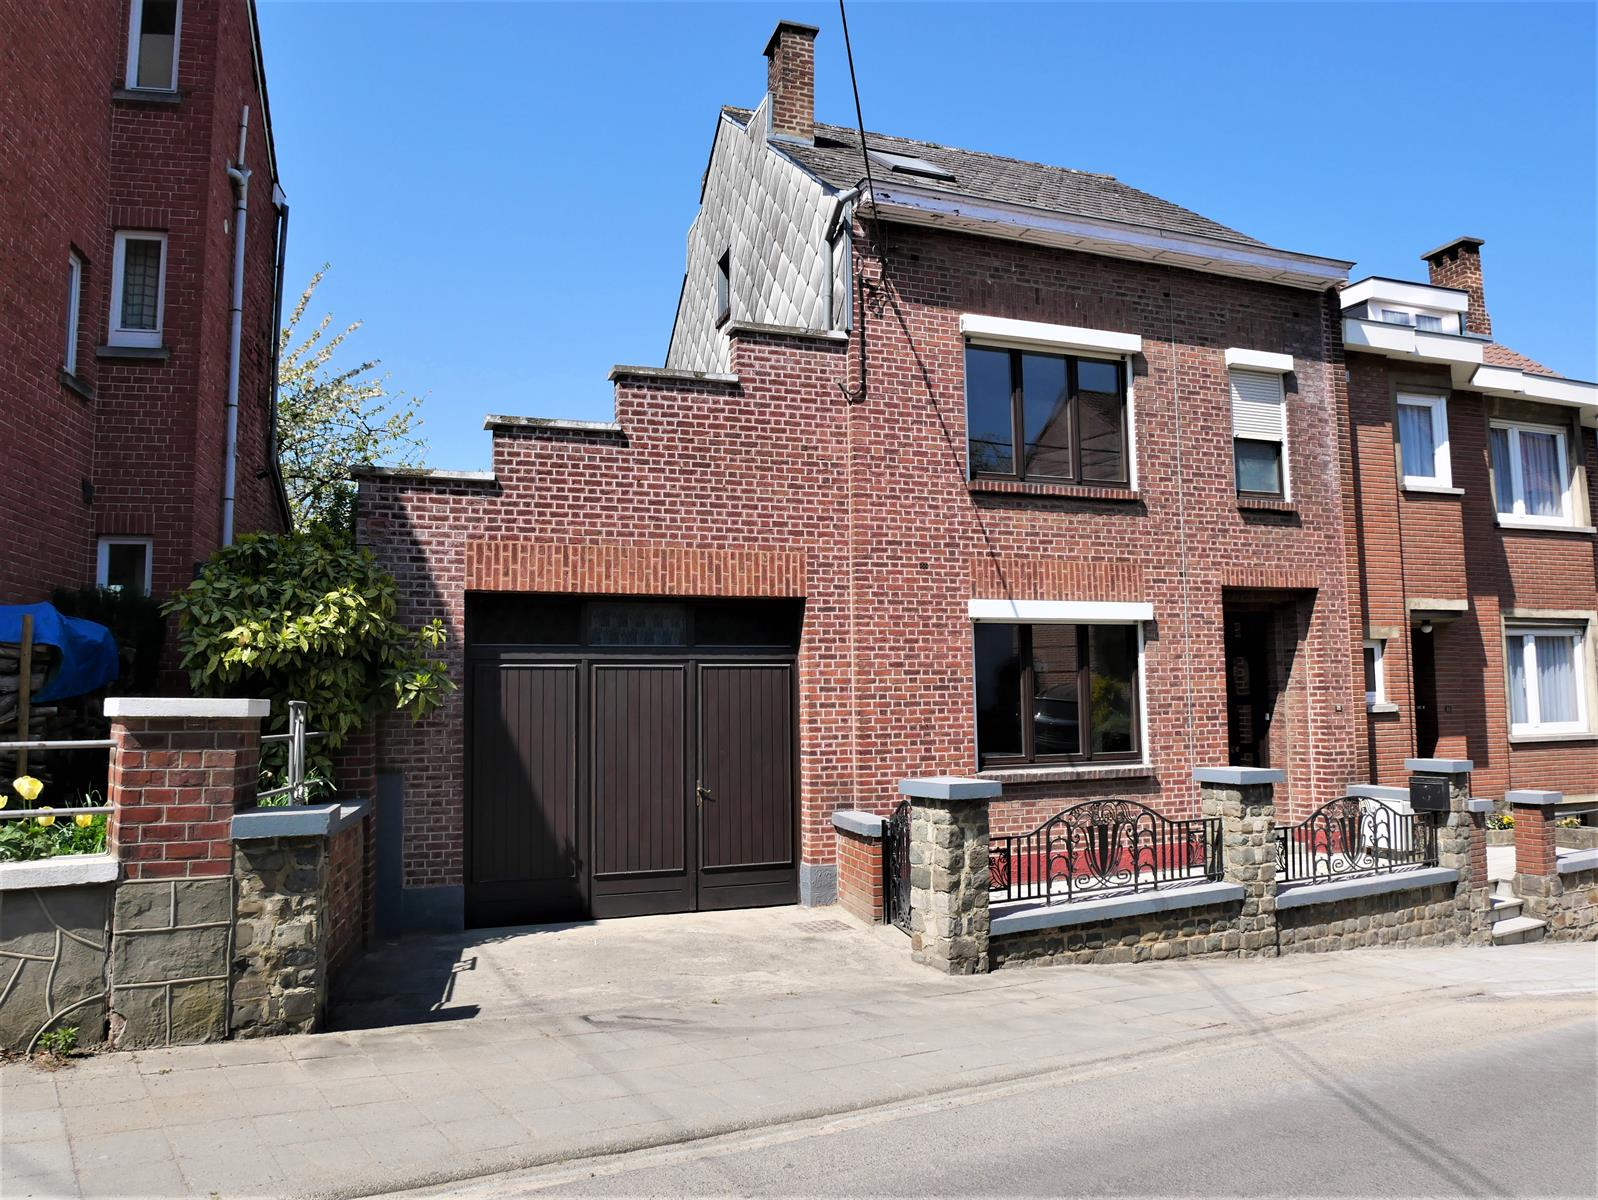 Maison - Ottignies-Louvain-la-Neuve - #4345933-0